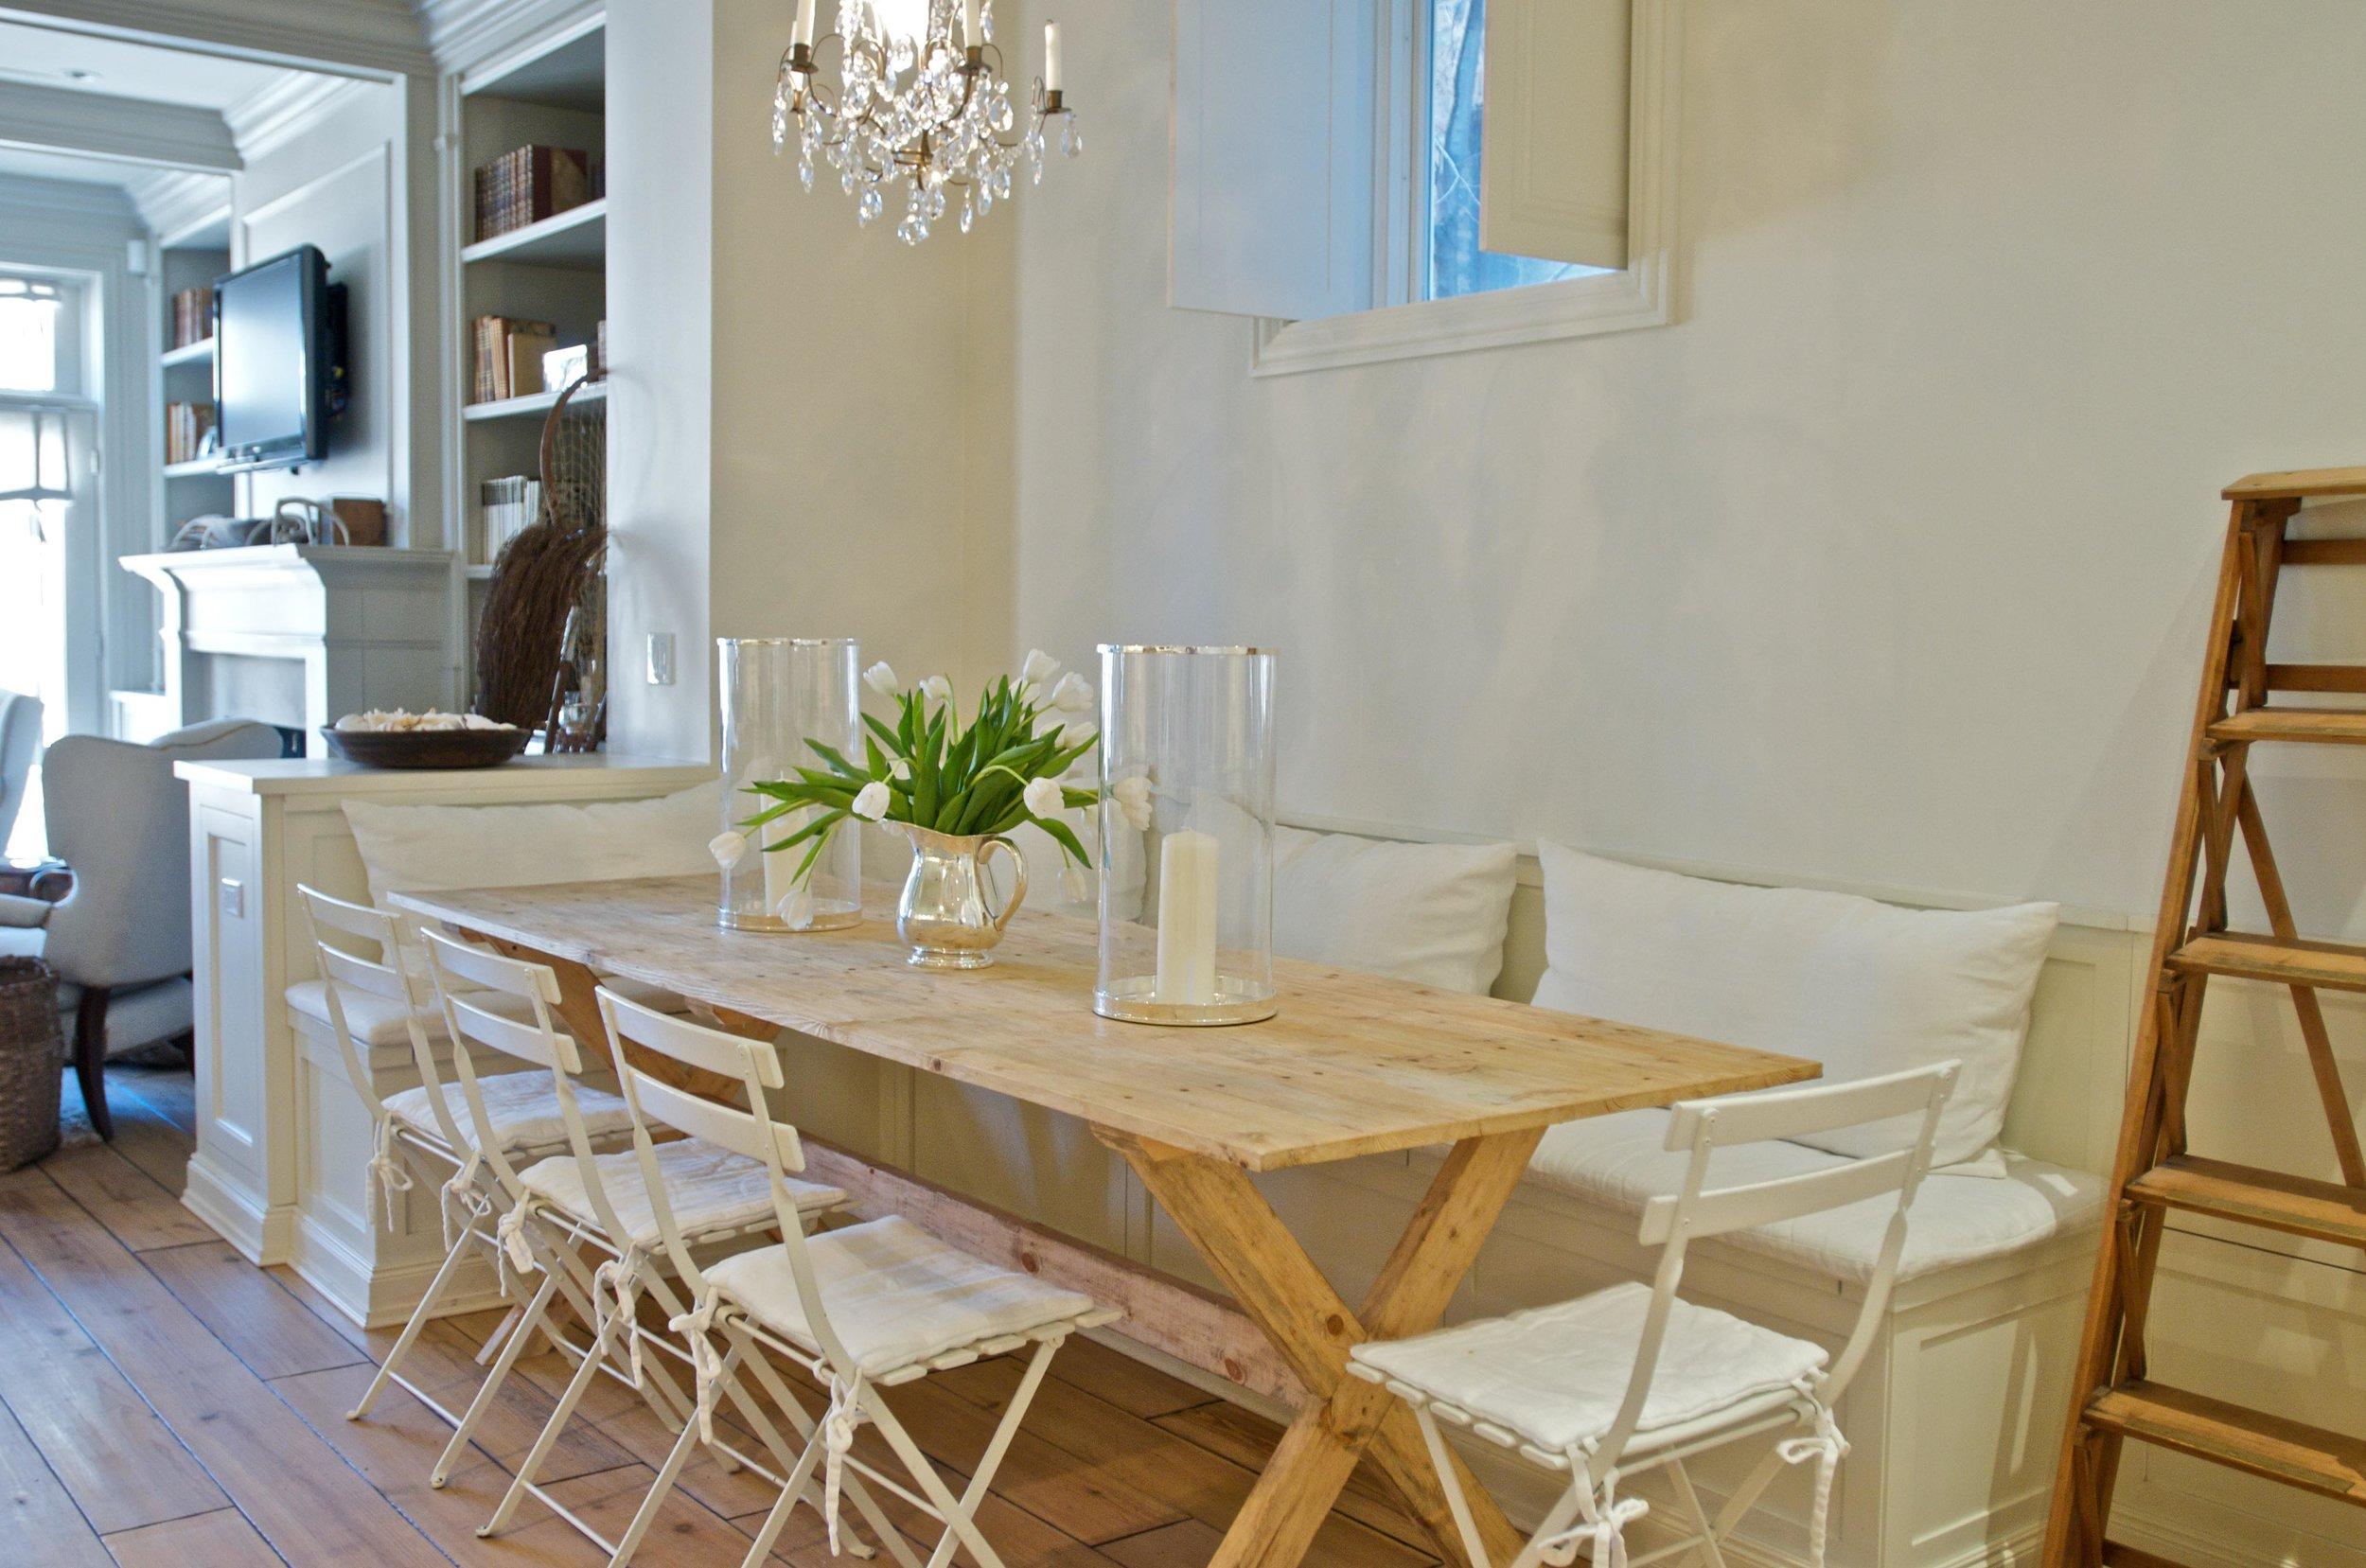 Leo_Designs_Chicago_interior_design_swedish_inspired22.jpg